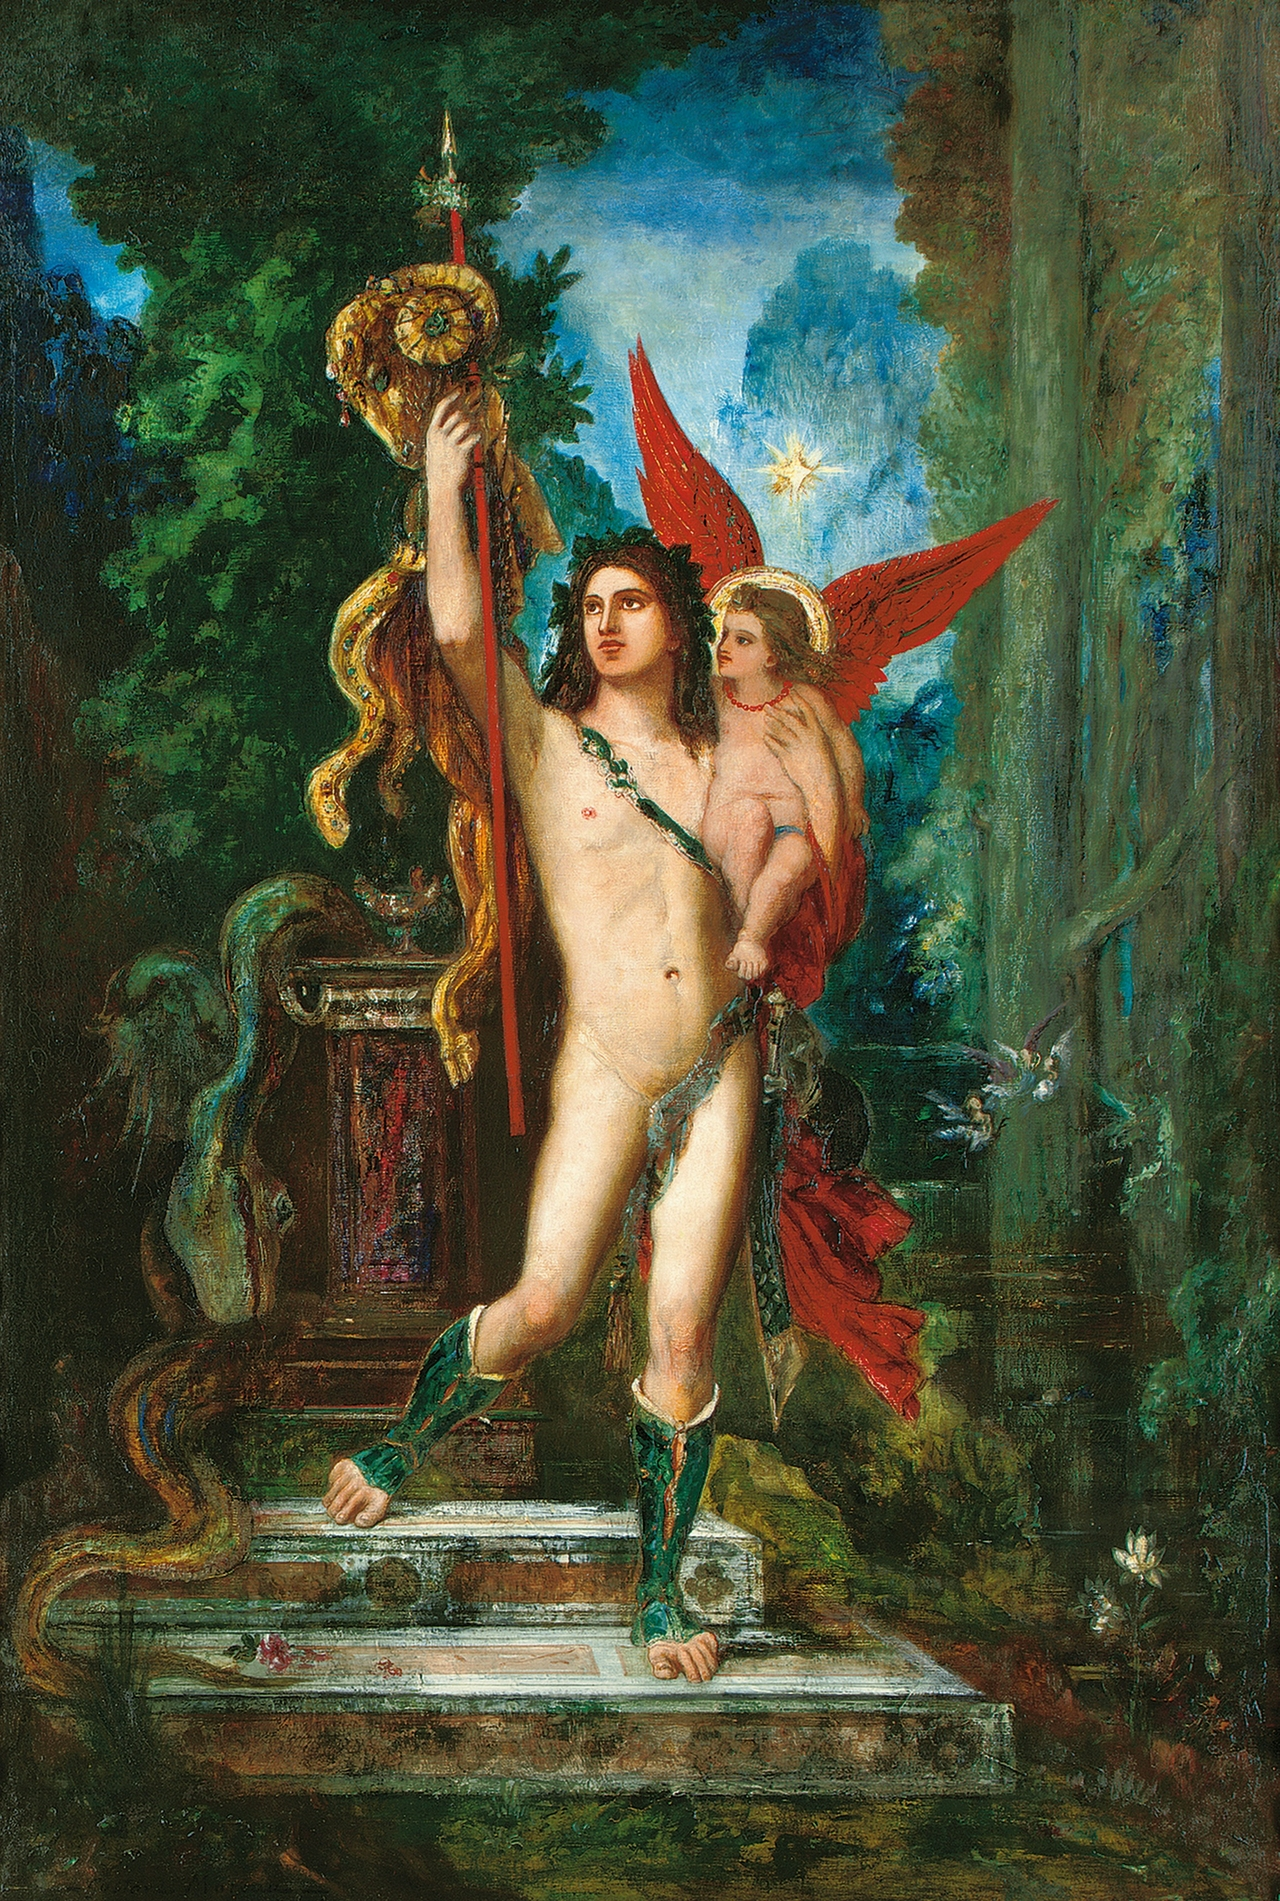 1890-1891_Ясон и Эрос (134 х 90.8 см)